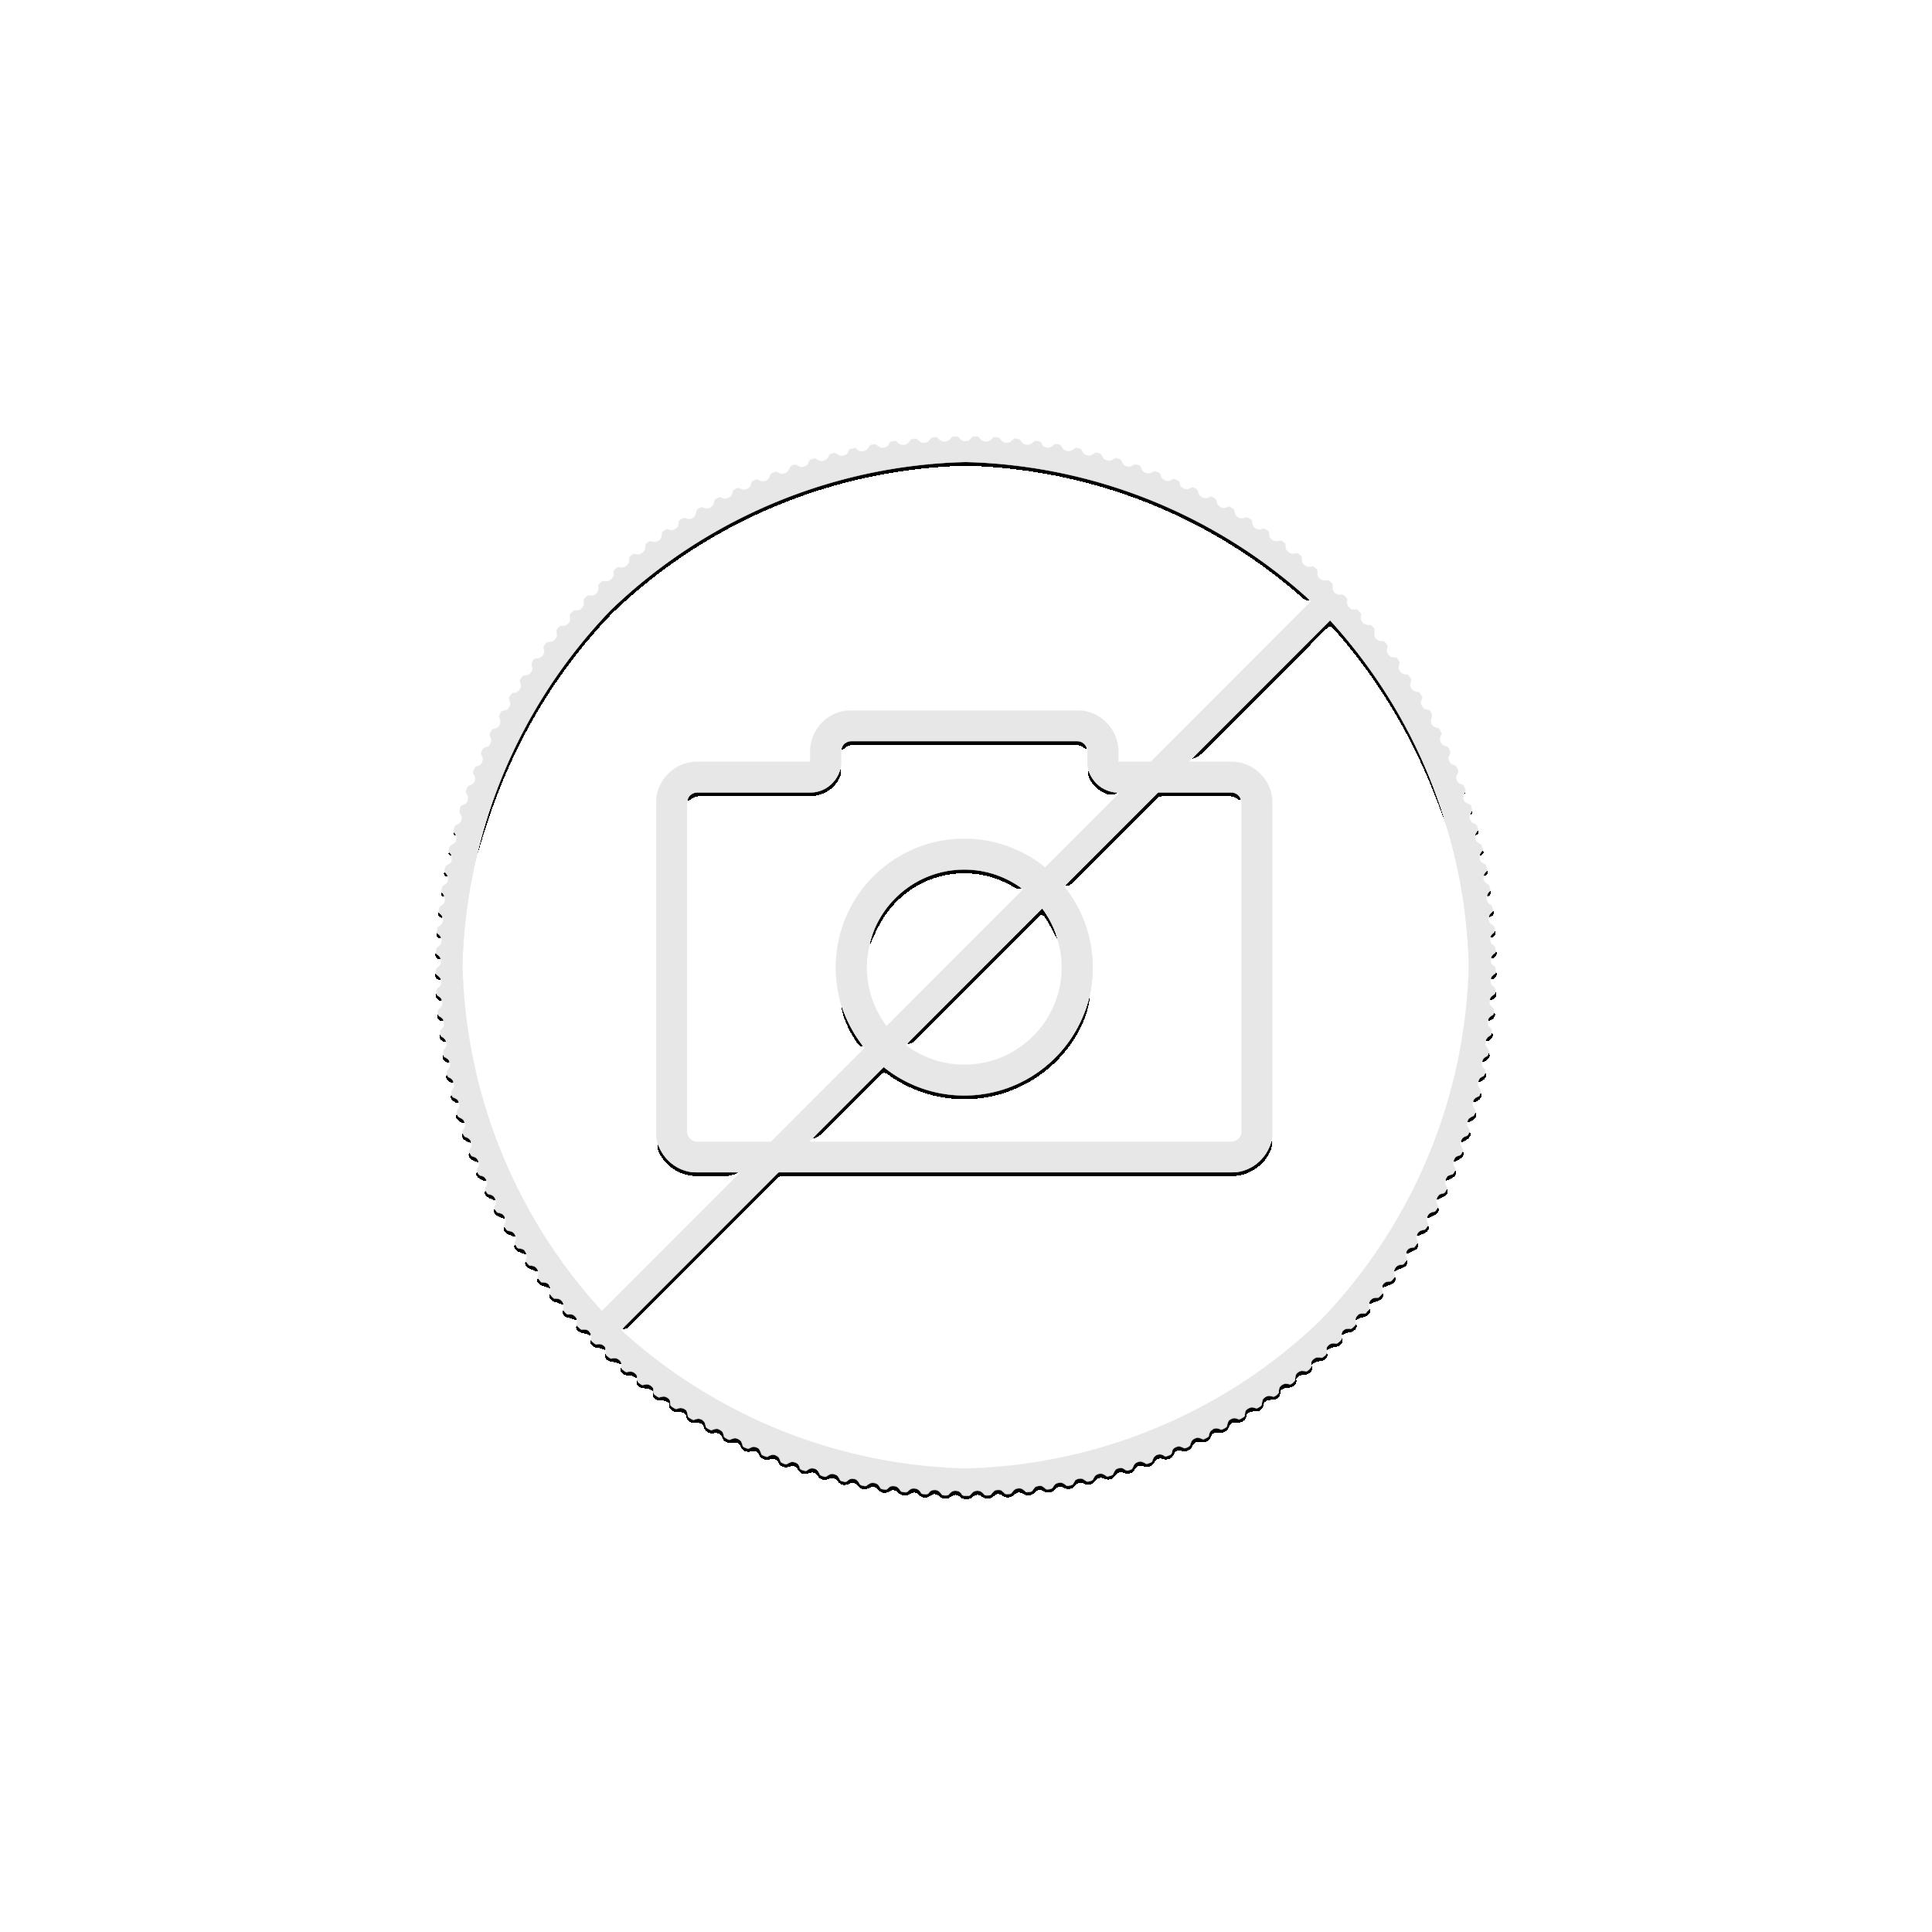 1/2 Troy ounce gold Krugerrand coin 2021